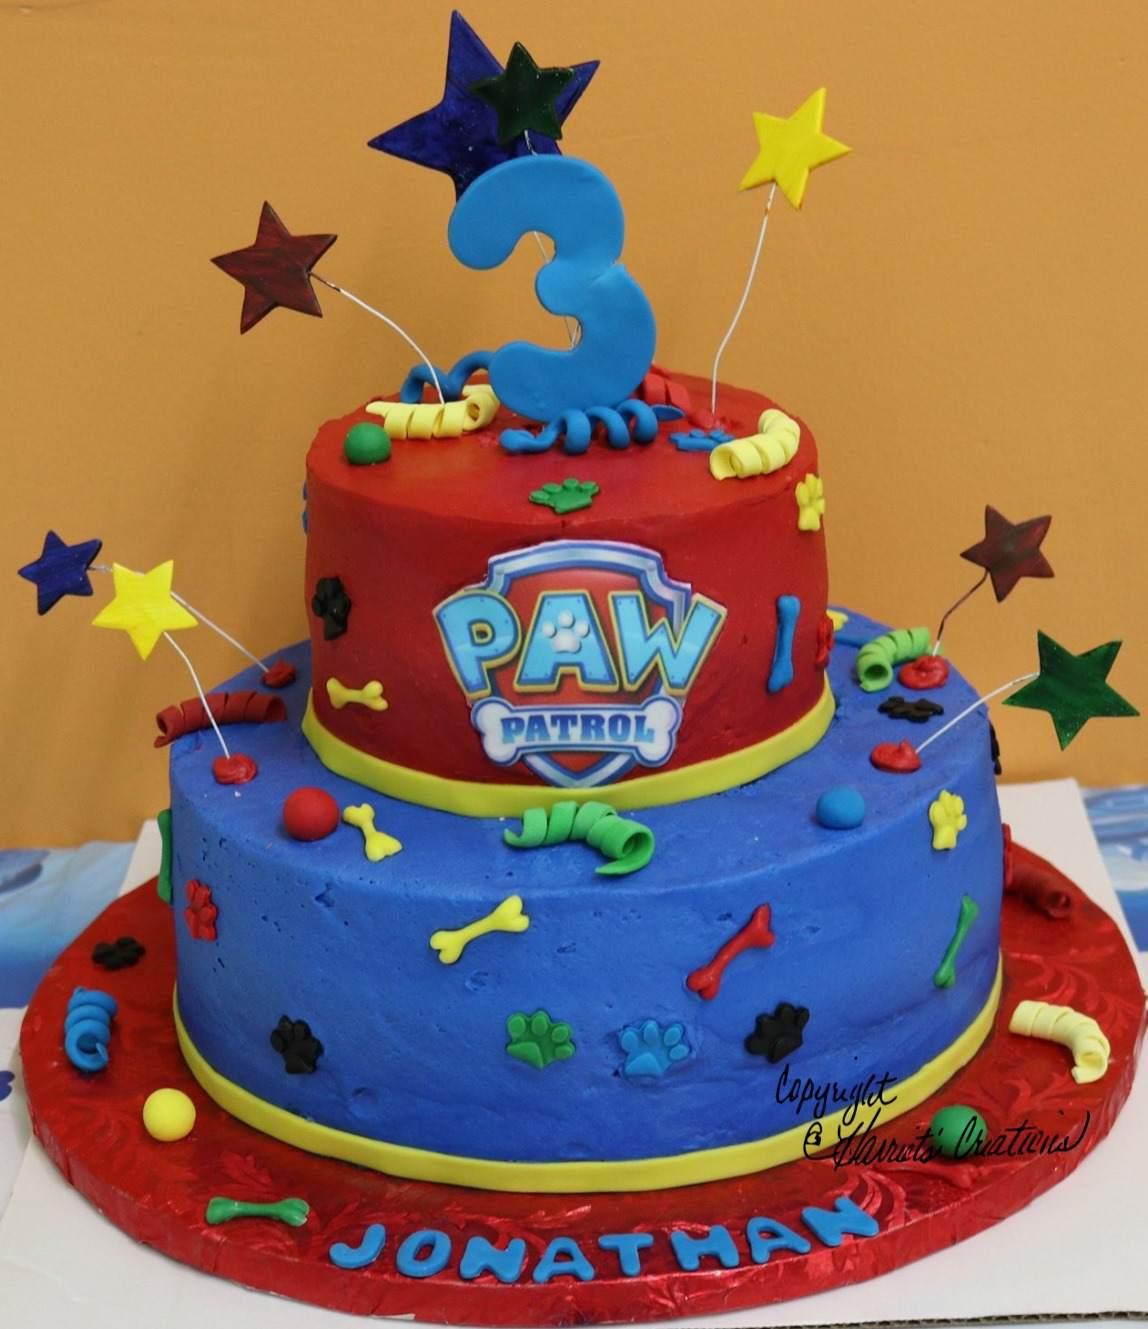 paw-patrol-two-tier-cake-third-birthday-party